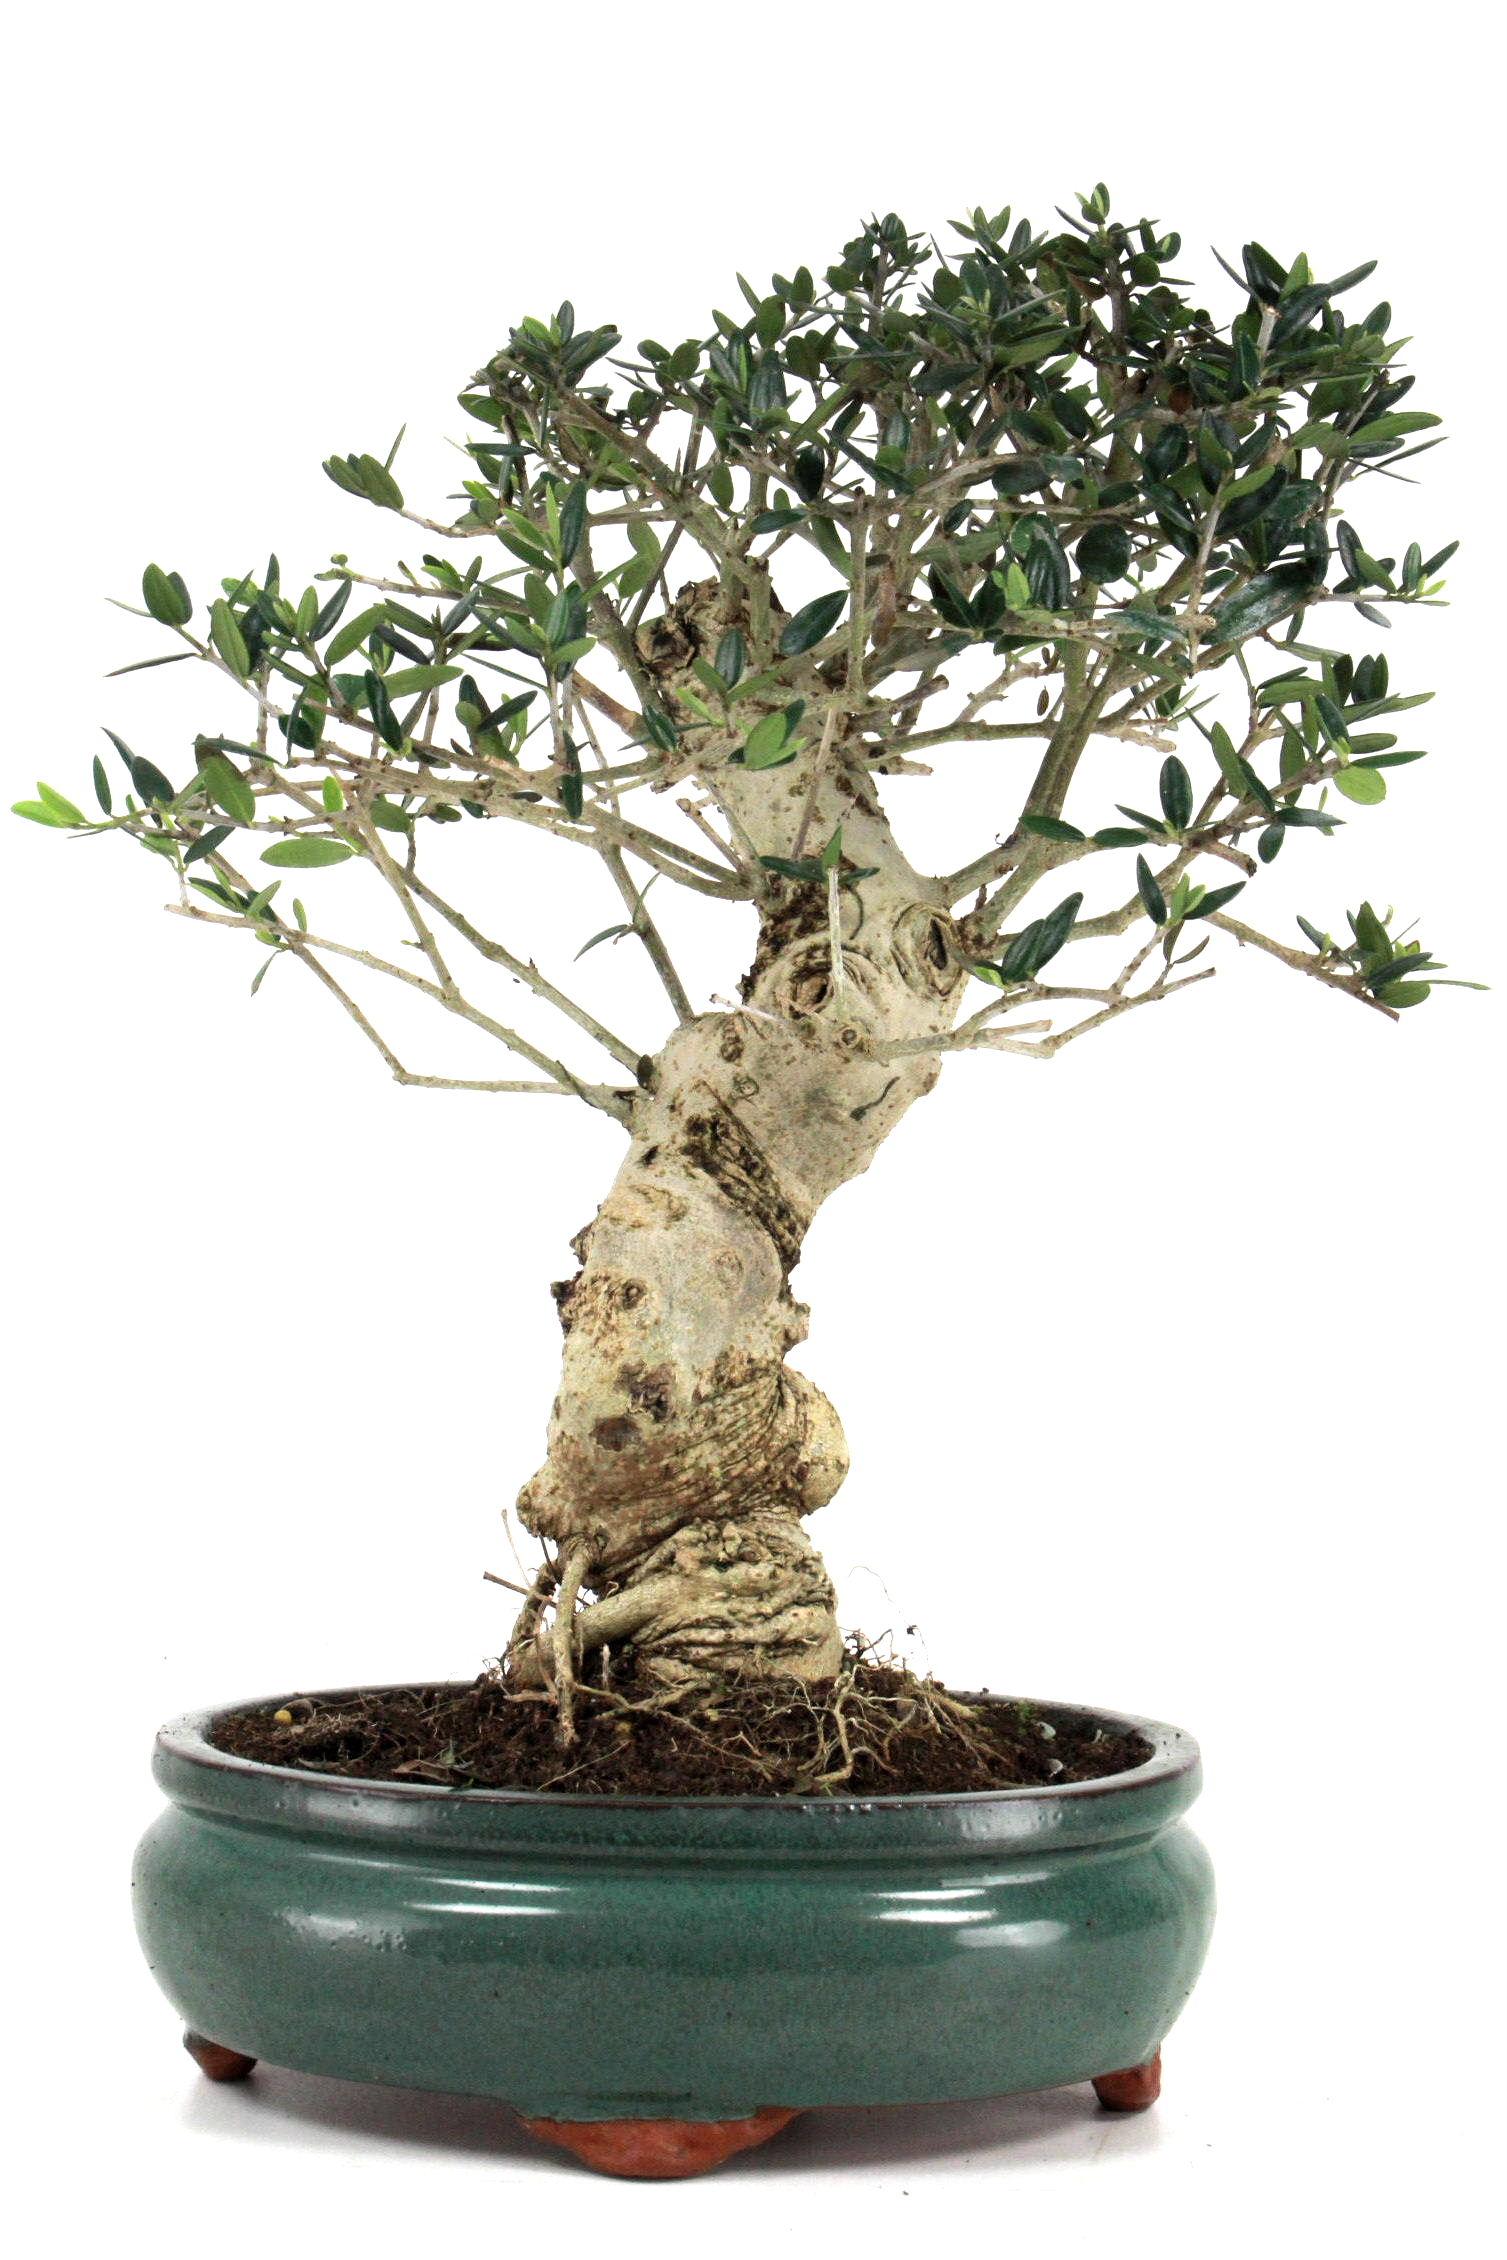 Olive bersicht onlineshop oyaki bonsai for Bonsai versand